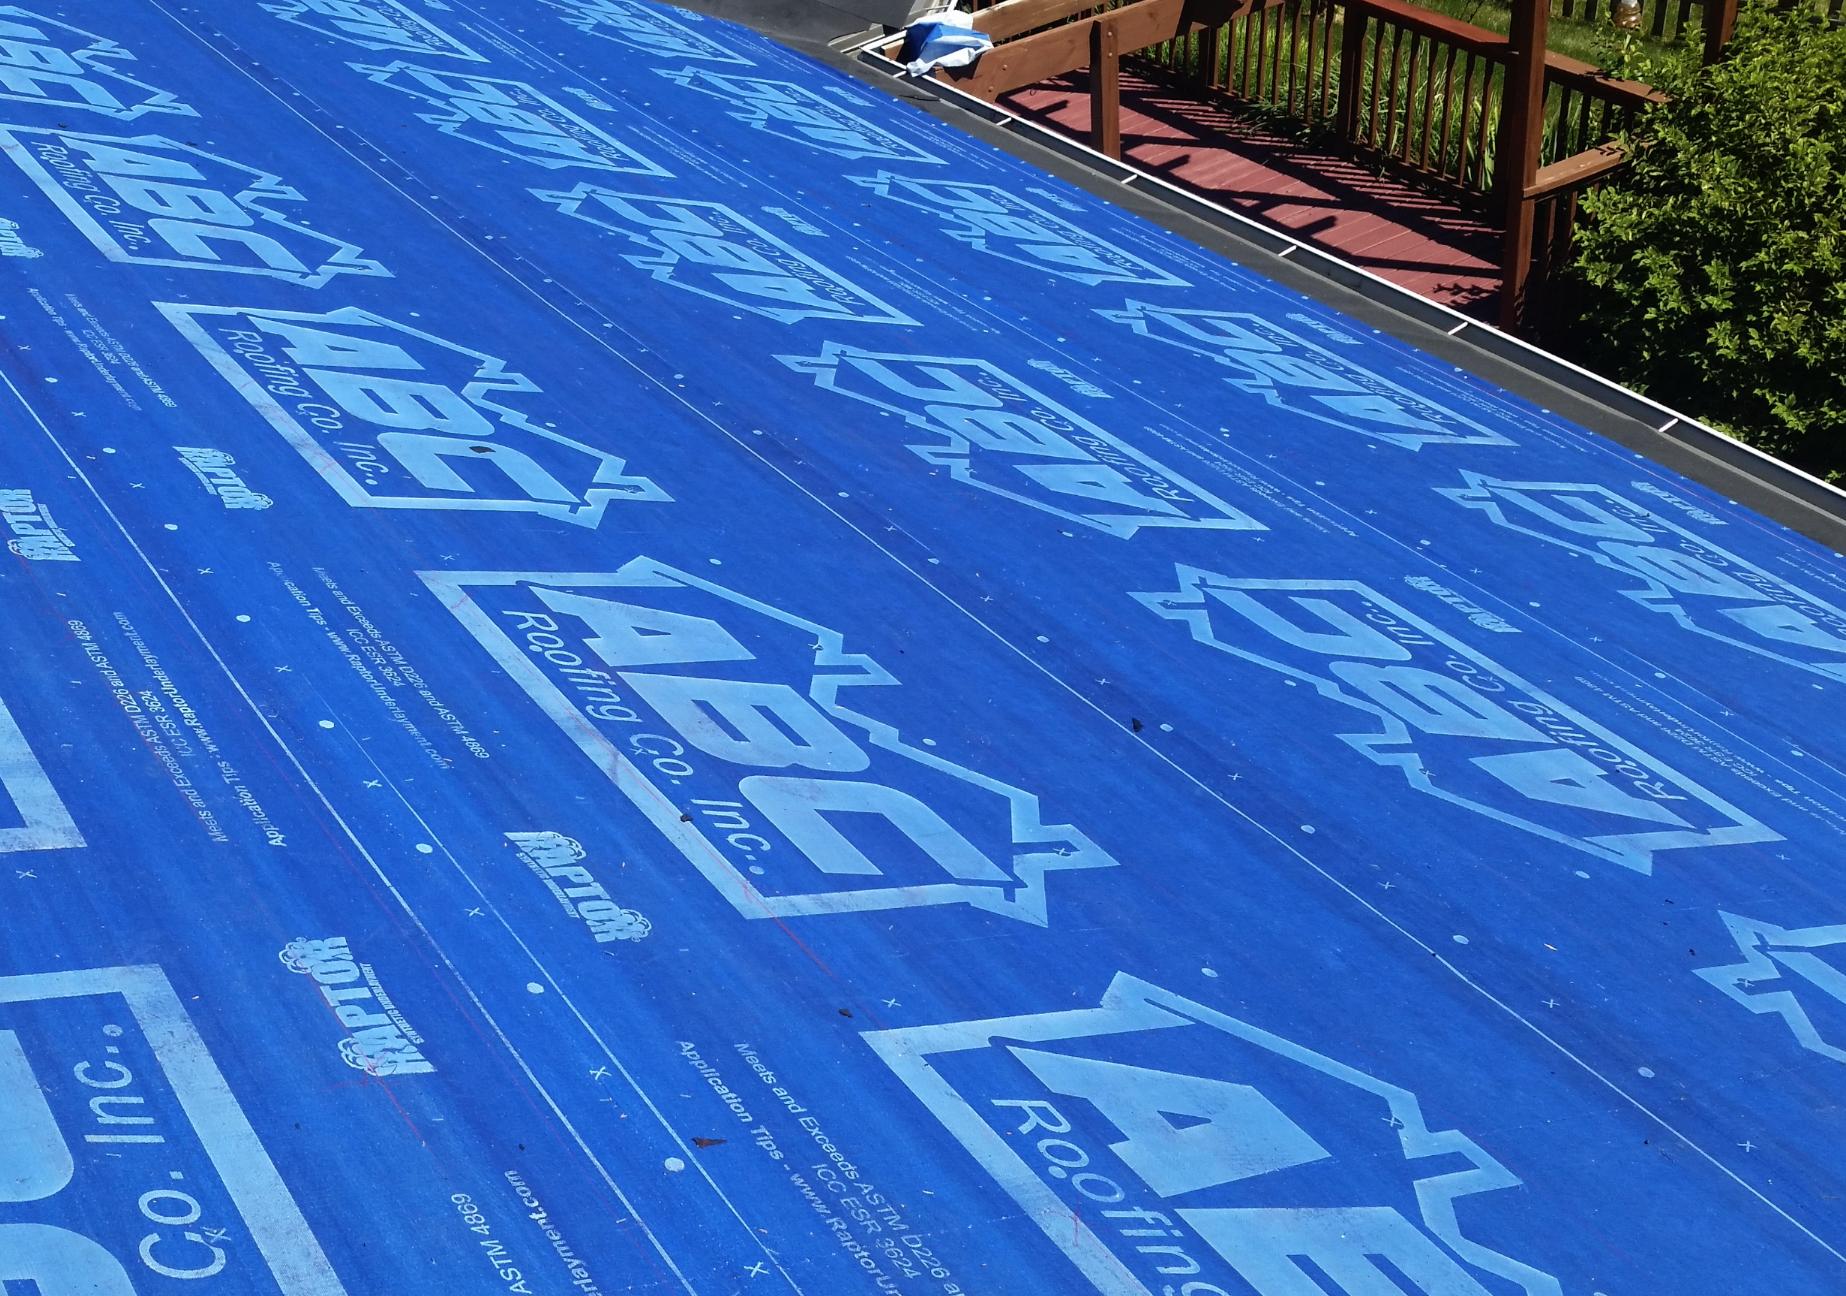 Blue ABC Roofing Raptor   Raptor Underlayment Memphite.com